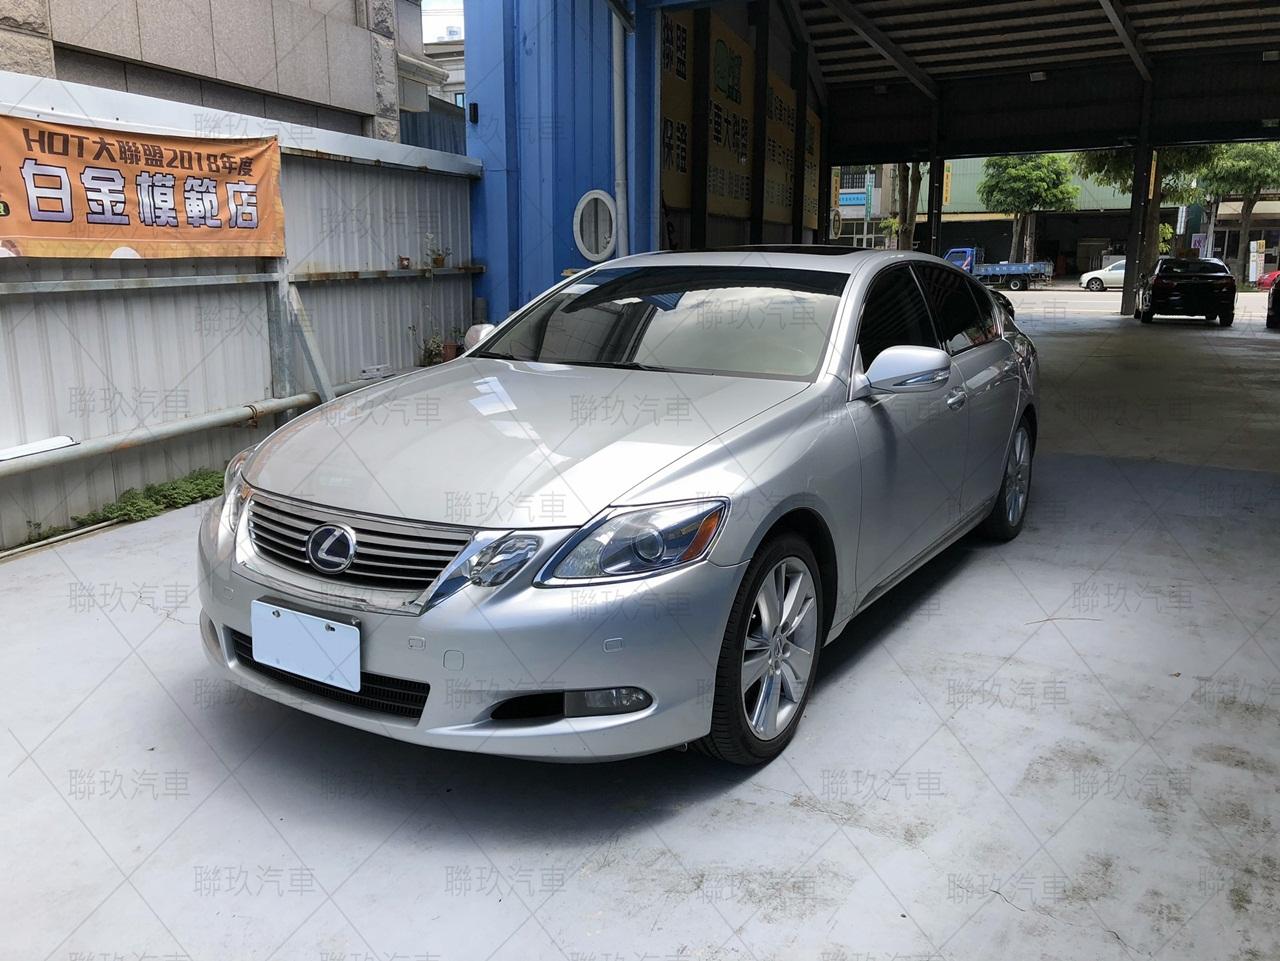 2010 Lexus 凌志 Gs